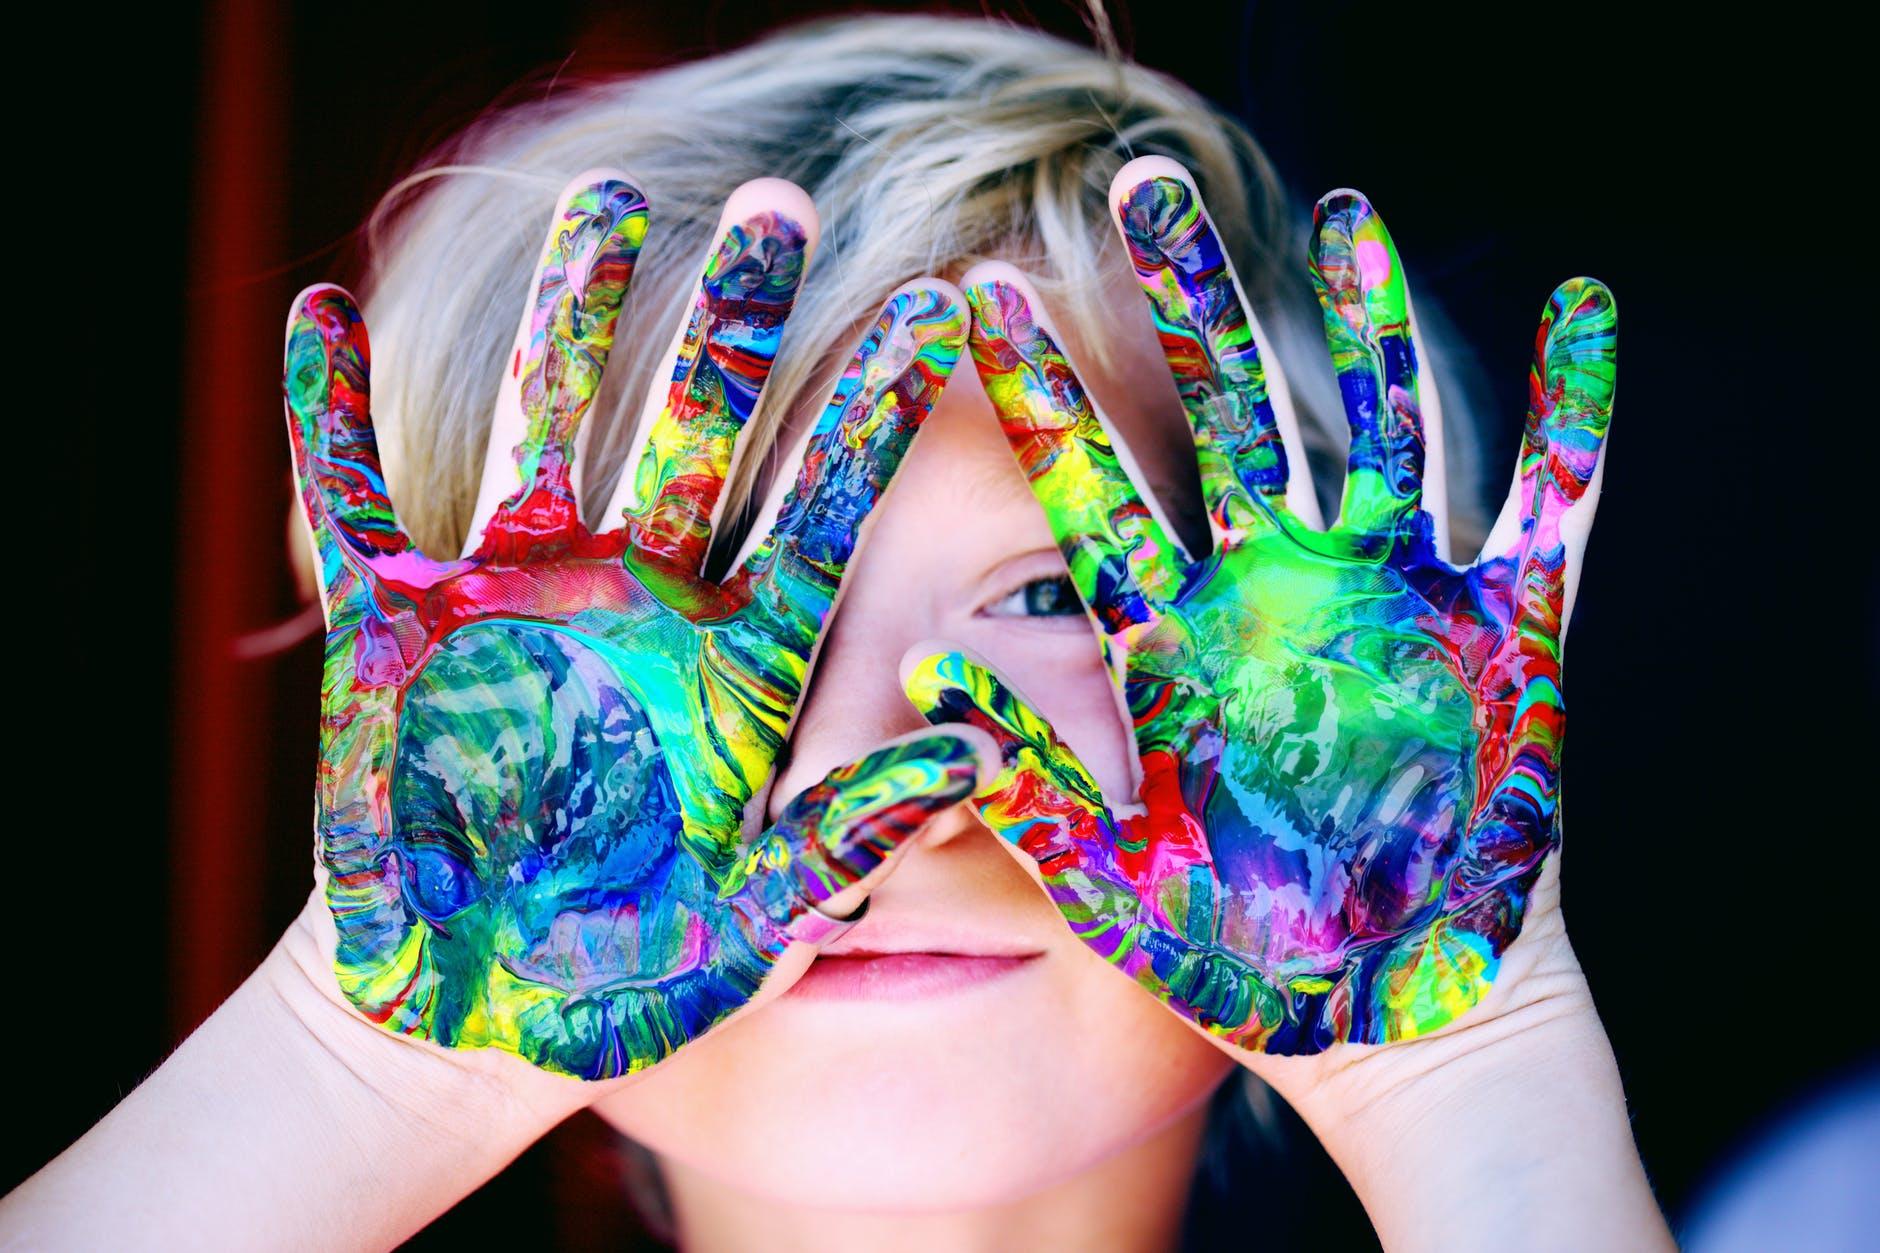 paints by polymerization